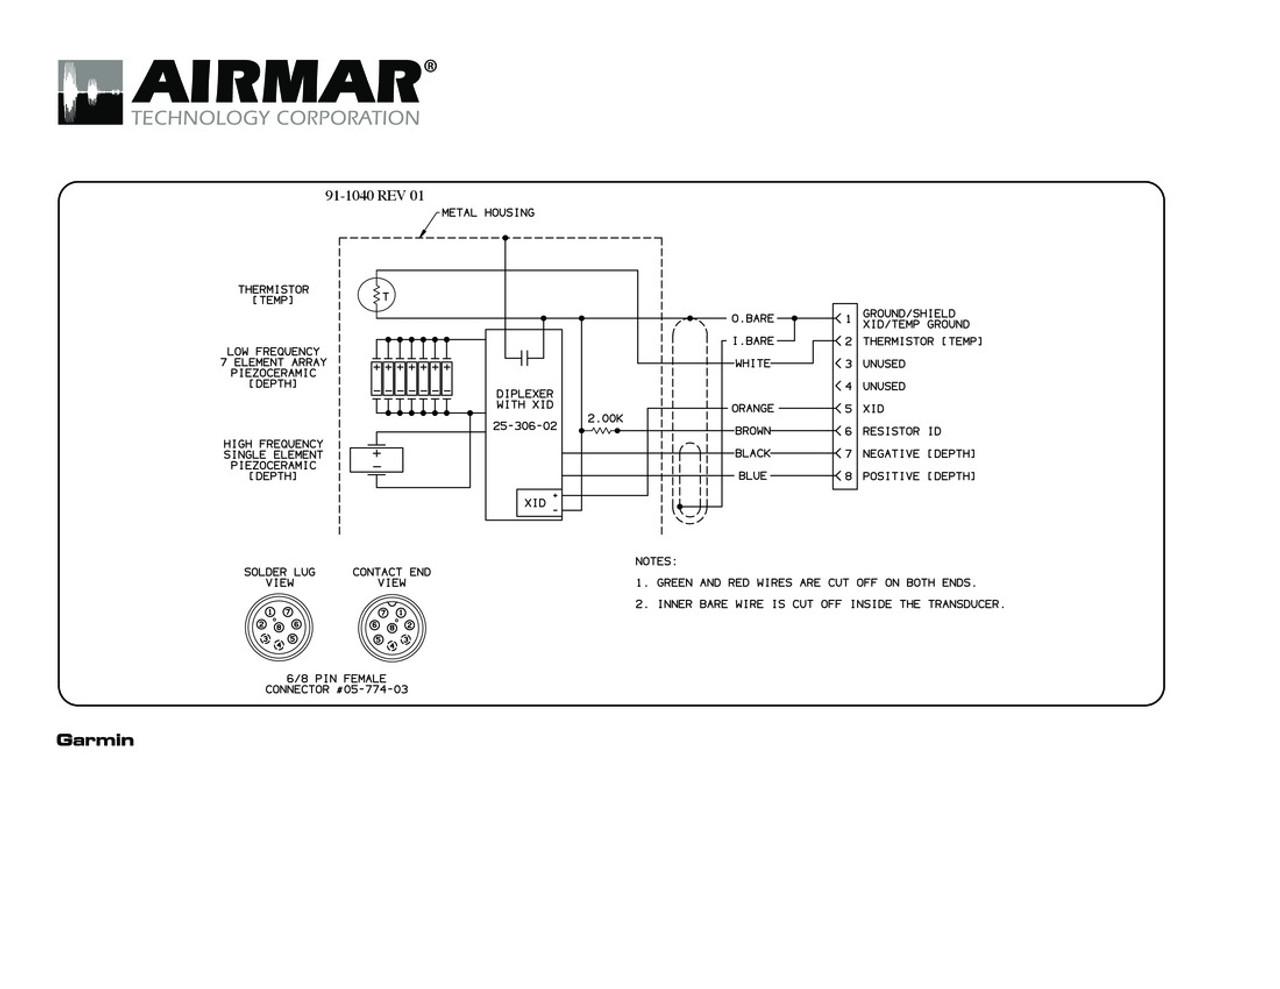 small resolution of garmin 128 wiring diagram wiring diagram datasourcegarmin 128 wiring diagram manual e book garmin 128 wiring